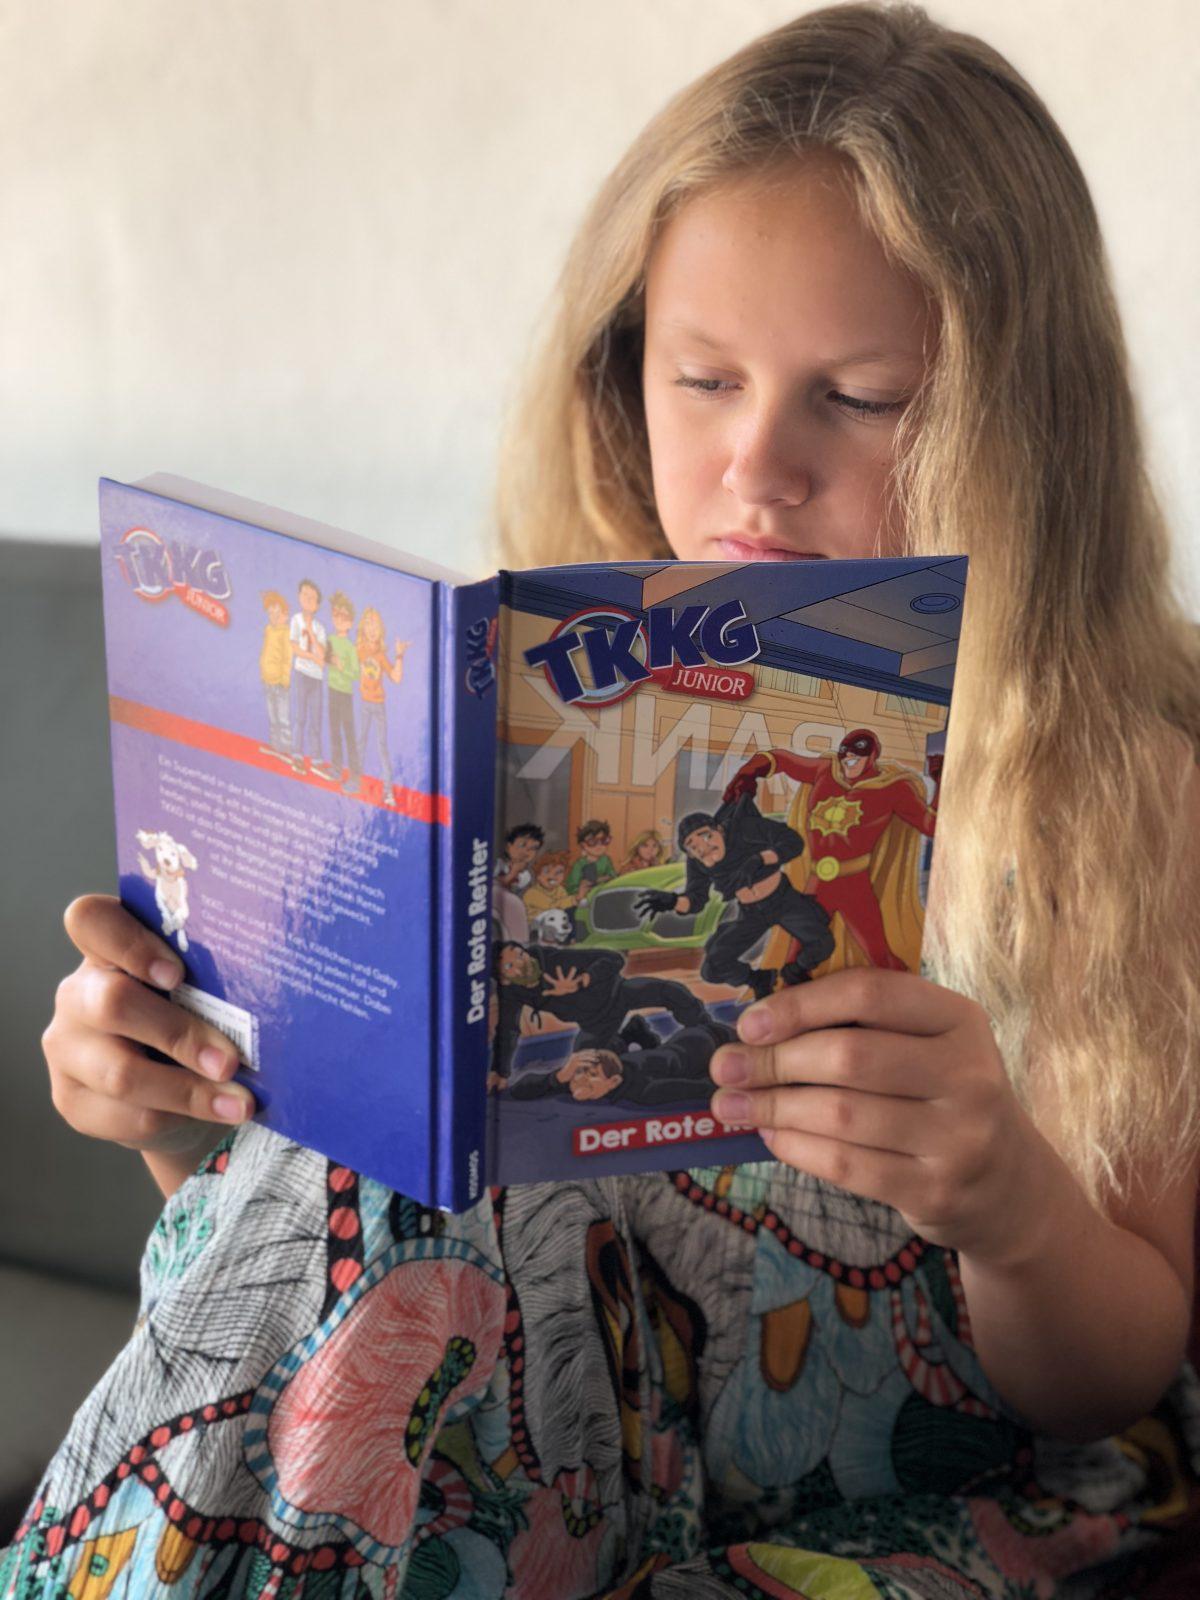 TKKG Junior im Kosmos Verlag | berlinmittemom.com